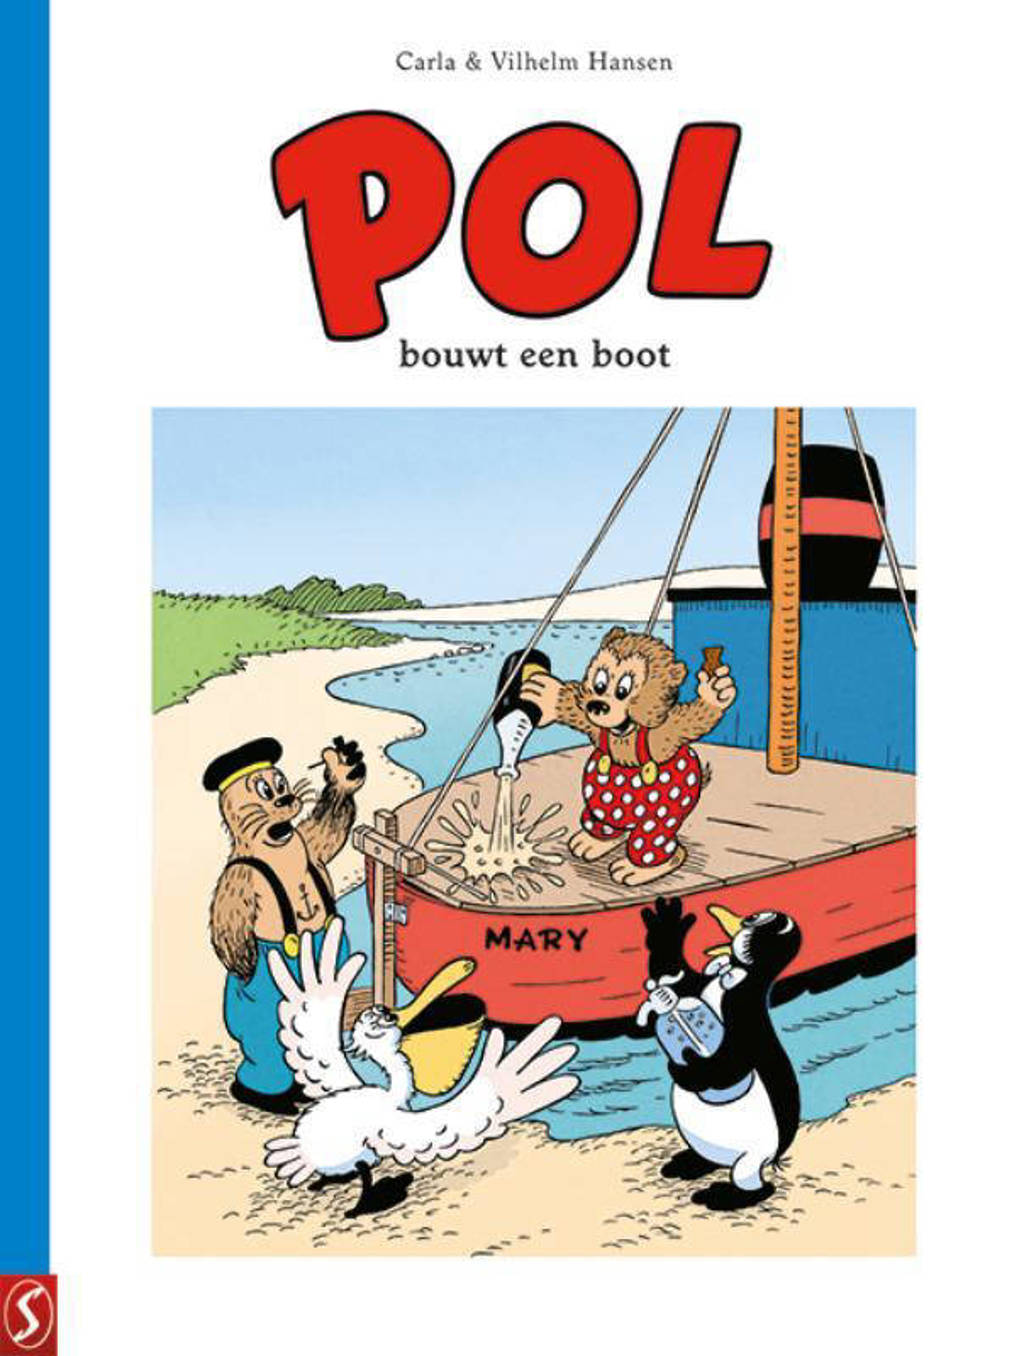 Pol: Pol bouwt een boot - Carla Hansen en Vilhelm Hansen